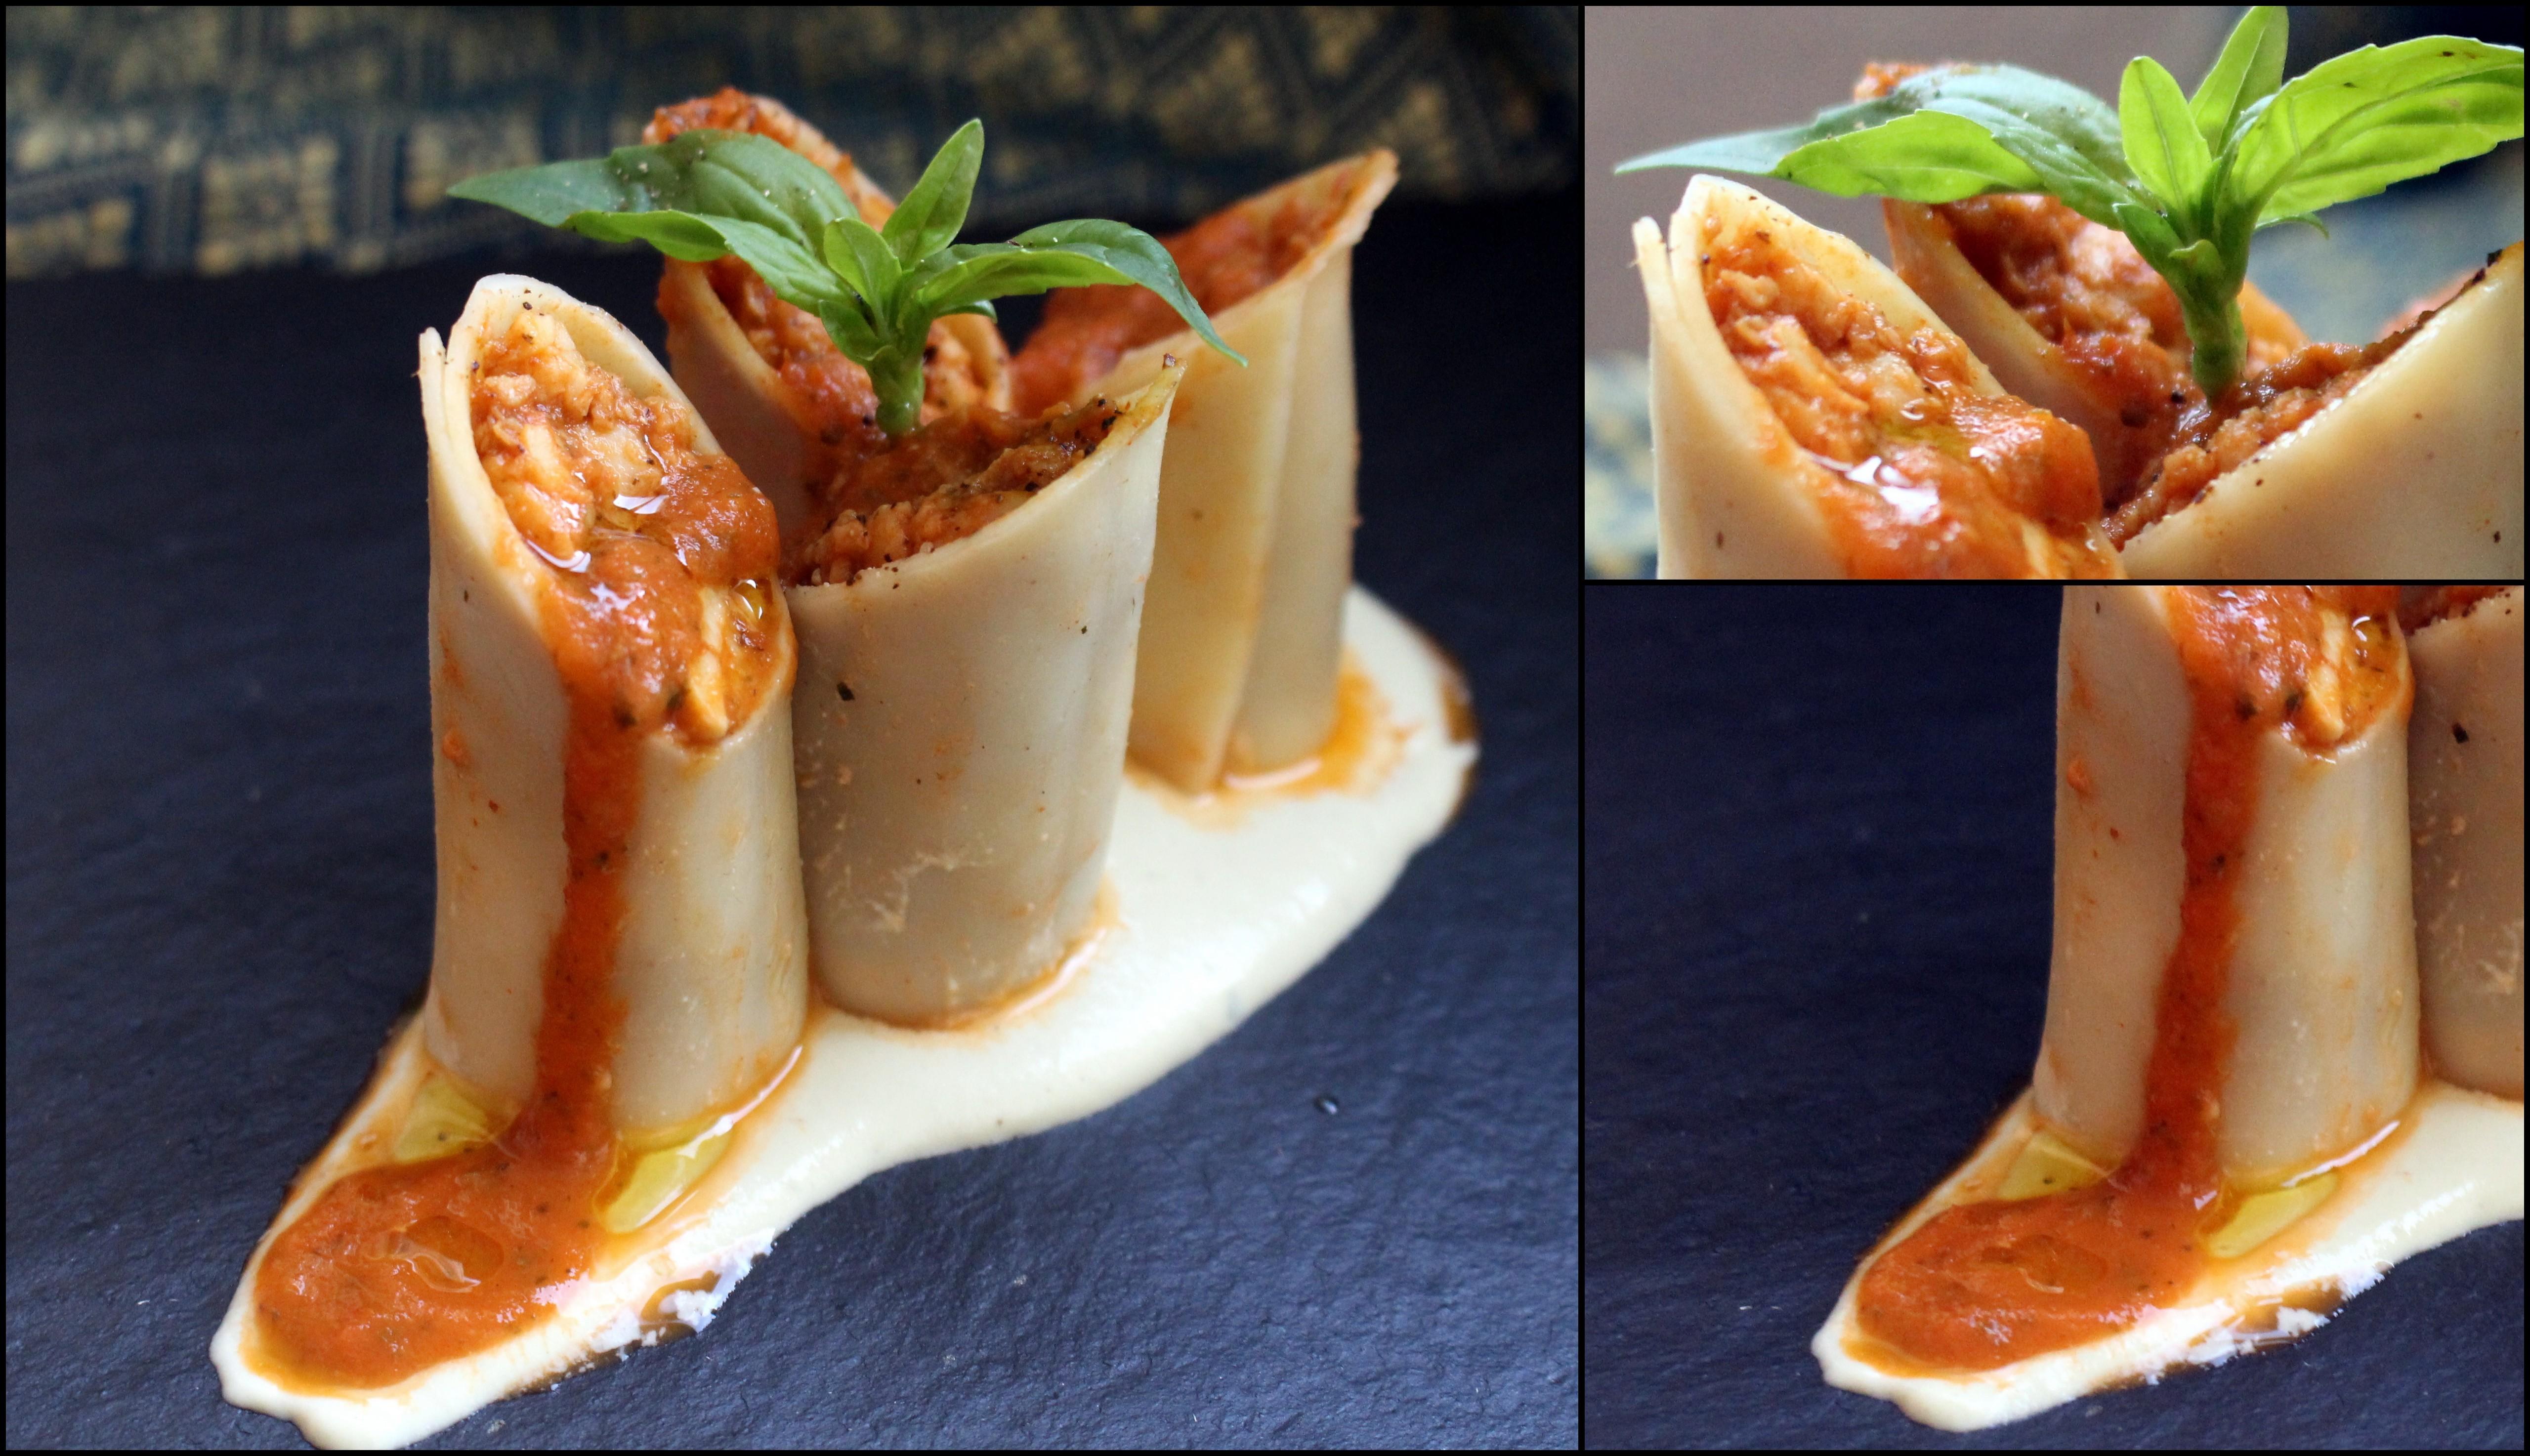 Canelones de tempeh con crema de queso casera